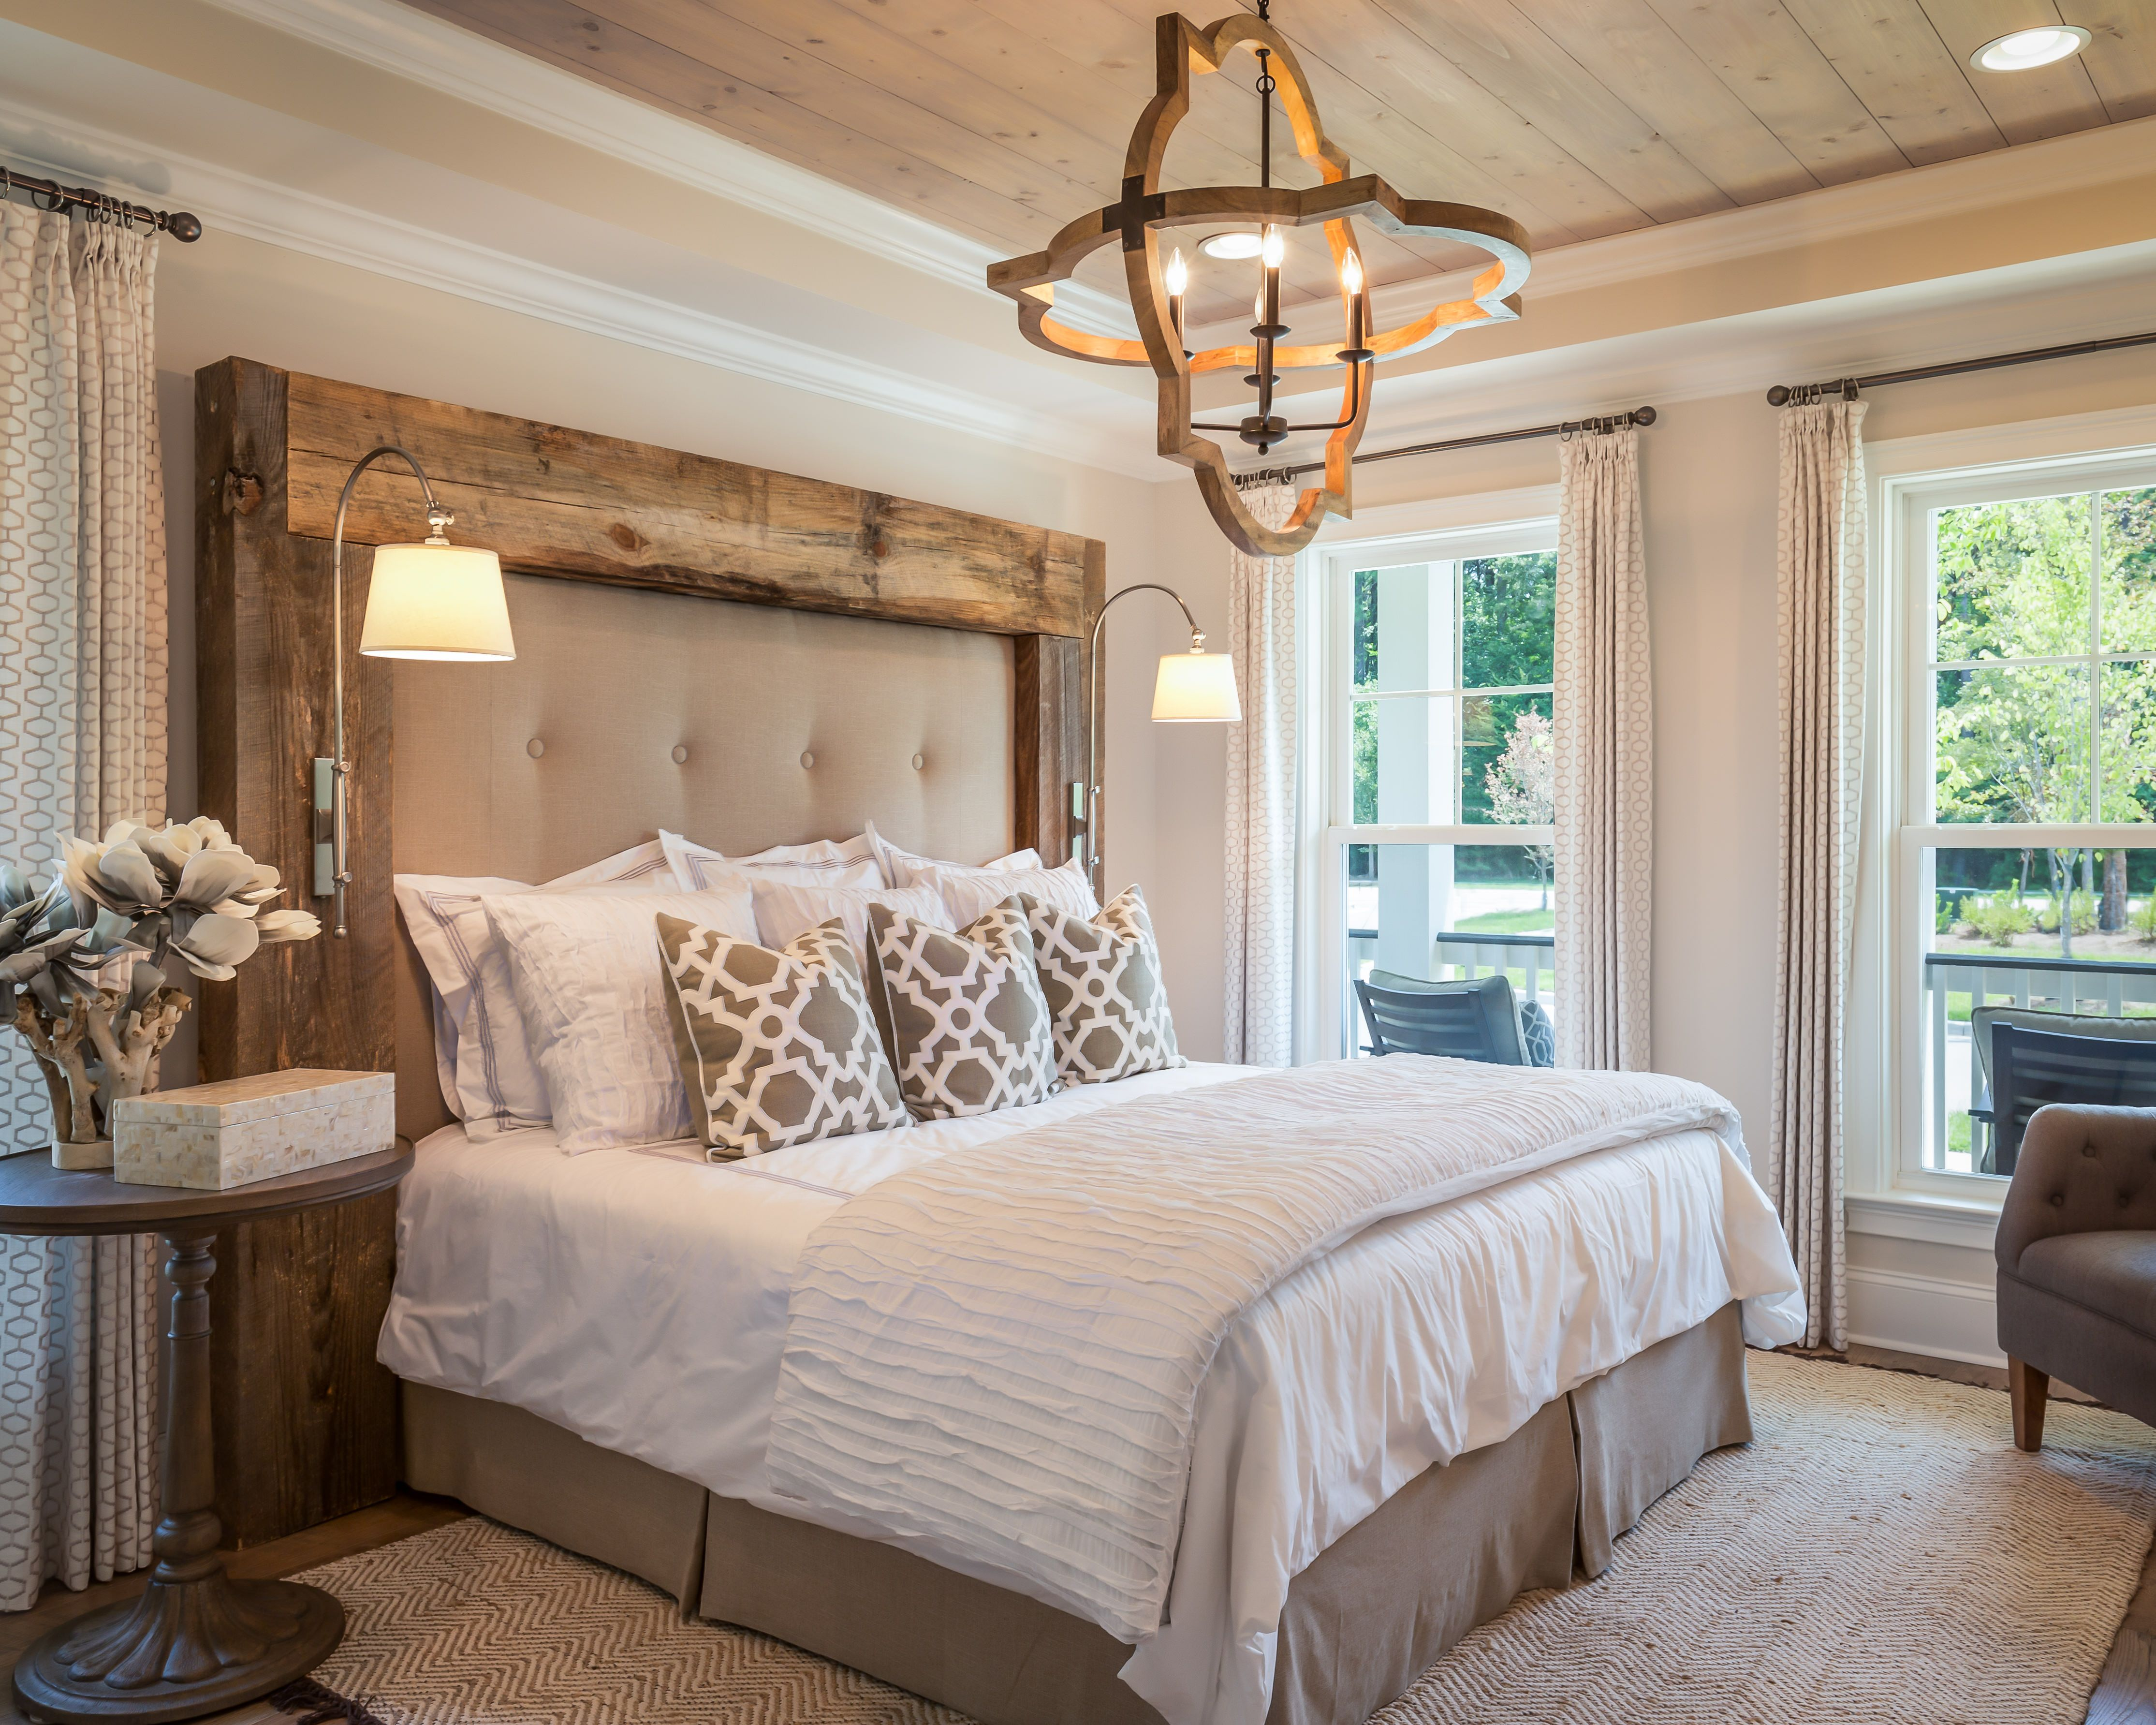 Calatlantic homes charleston sc model home merchandising